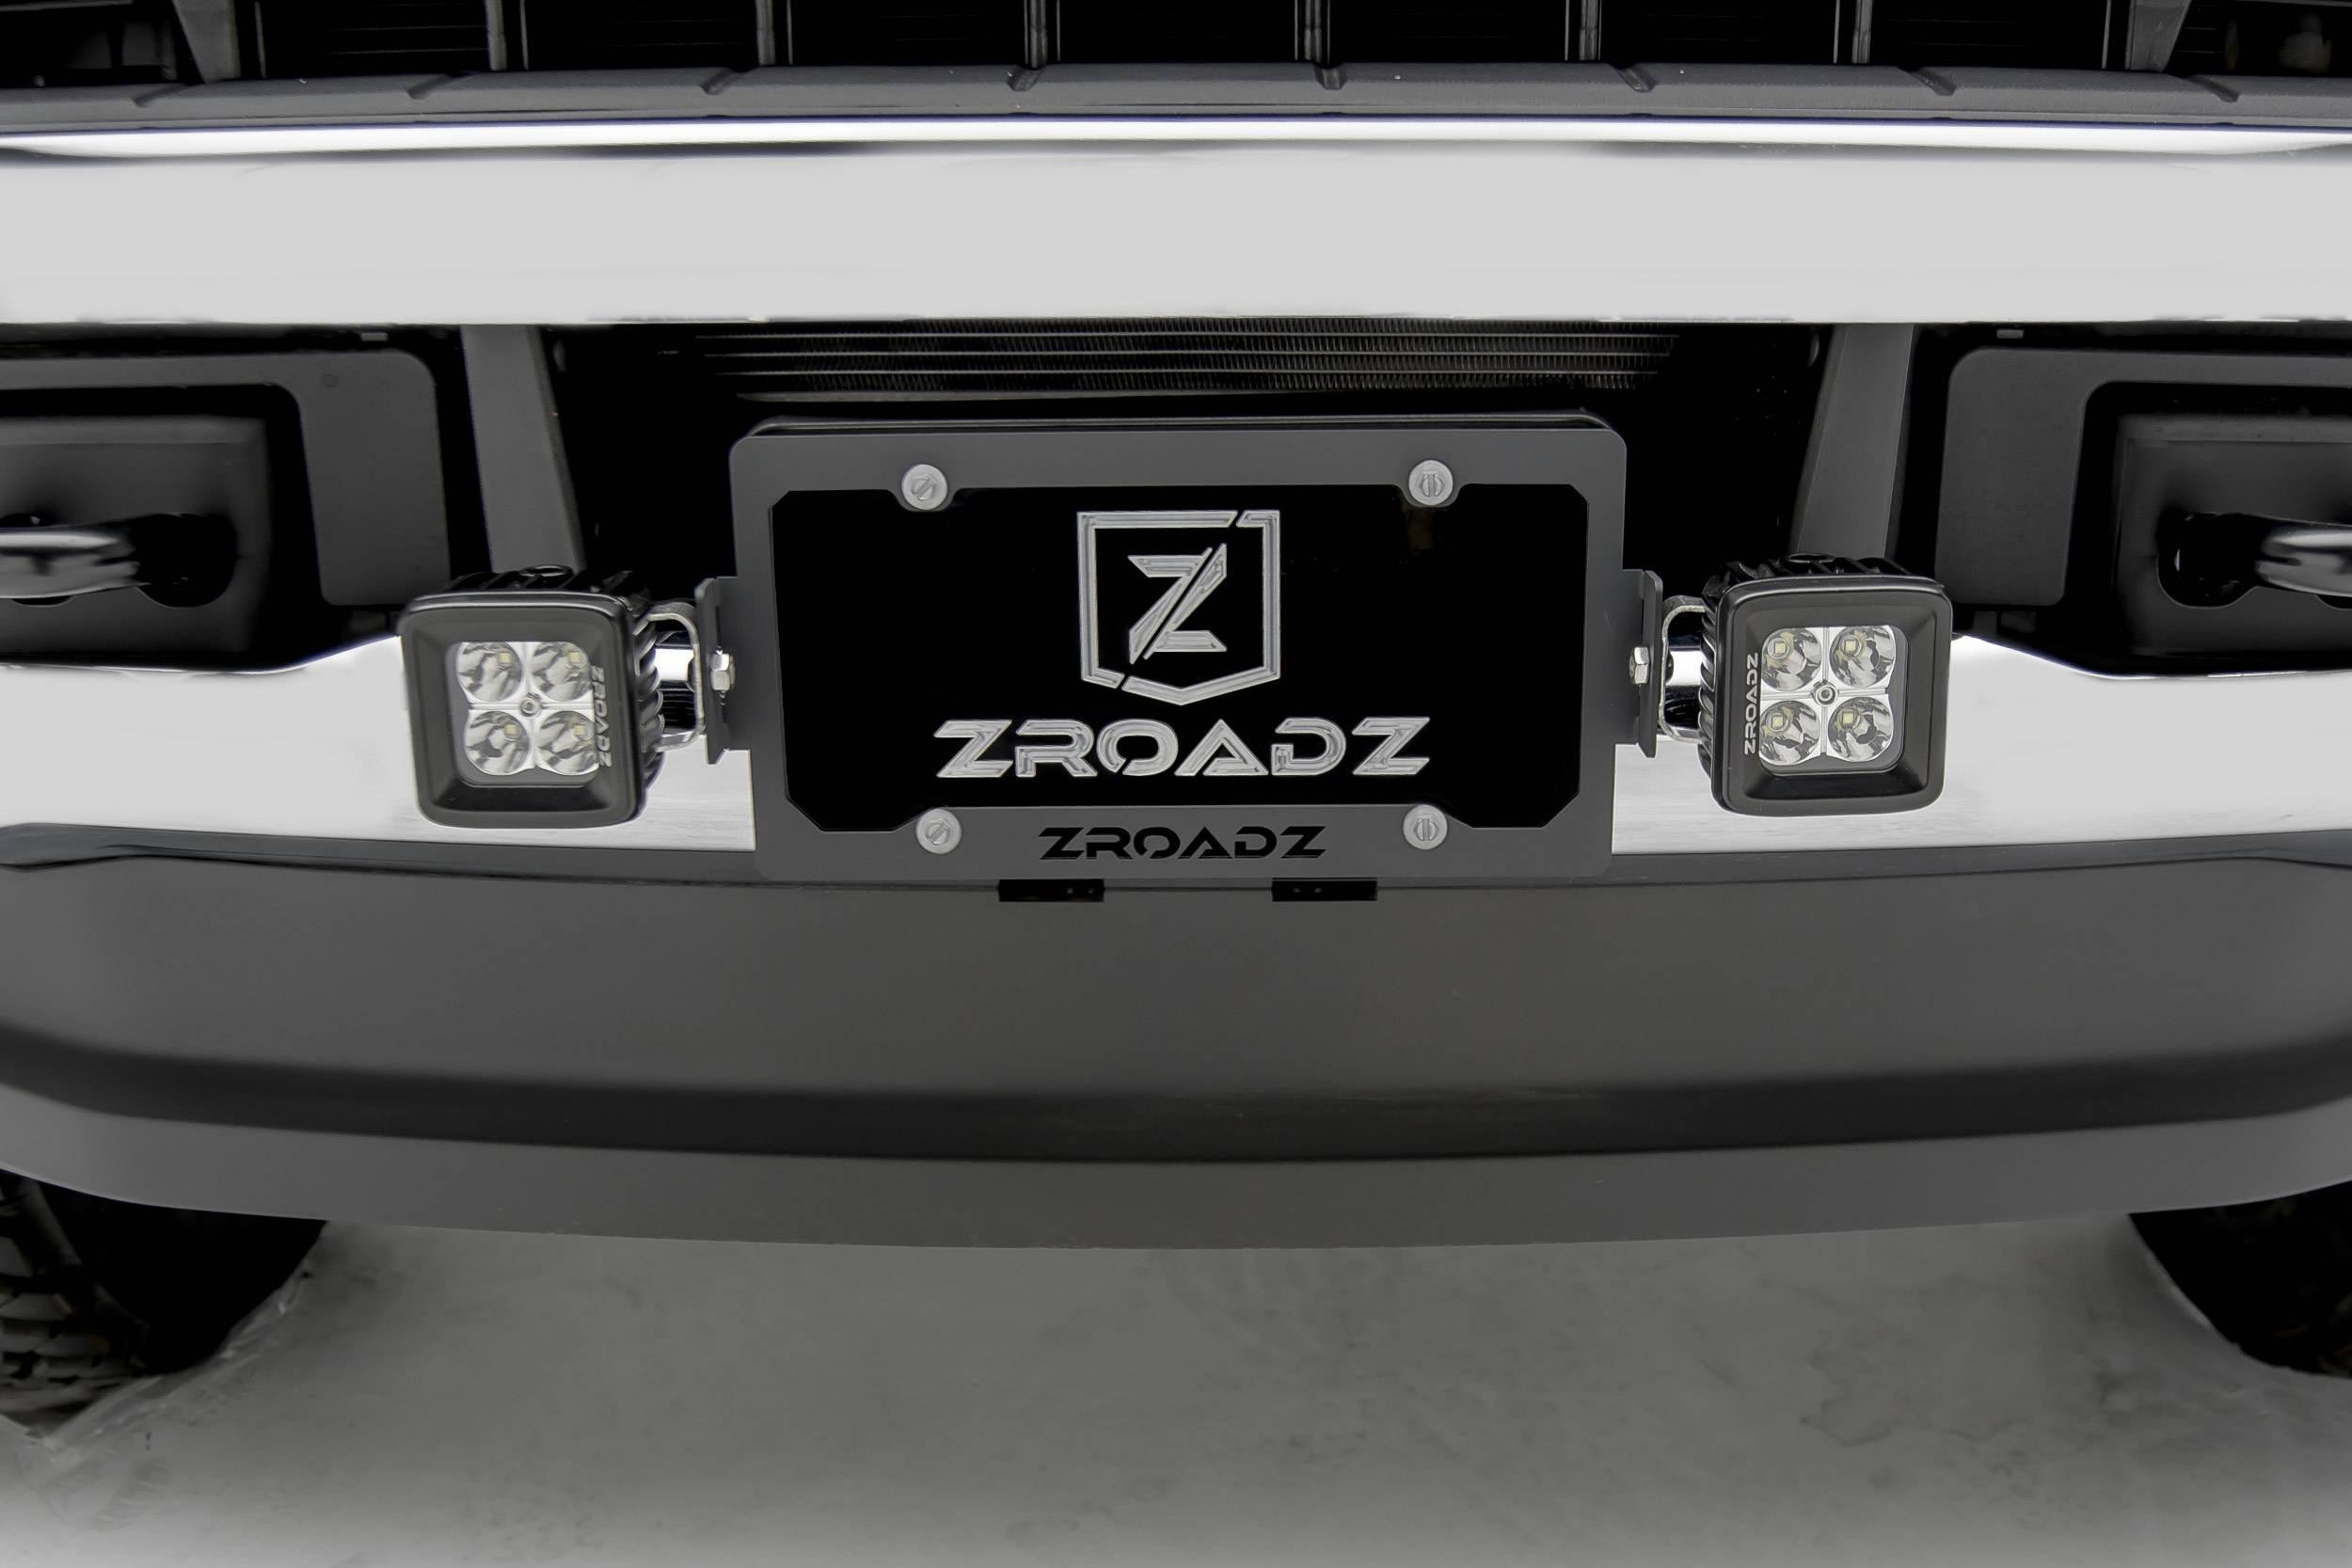 ZROADZ                                             - Universal License Plate Frame LED Kit with (2) 3 Inch LED Pod Lights - PN #Z310005-KIT